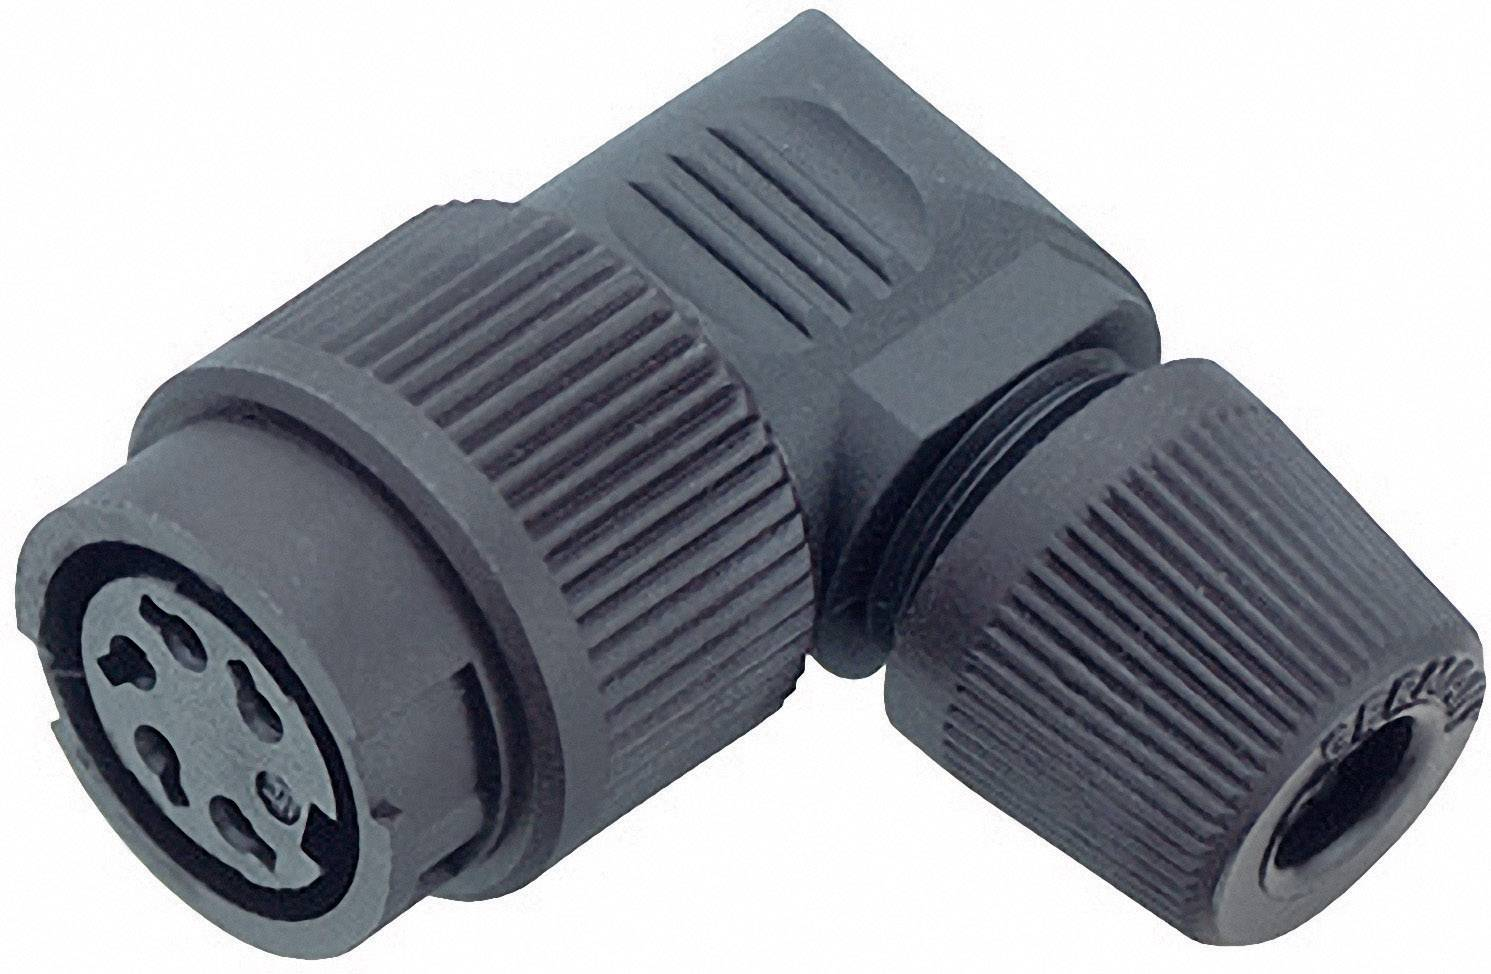 Kabelový konektor Binder 99-0606-70-03, 3pól., 0.75 mm², 4 - 6 mm, IP40, černá